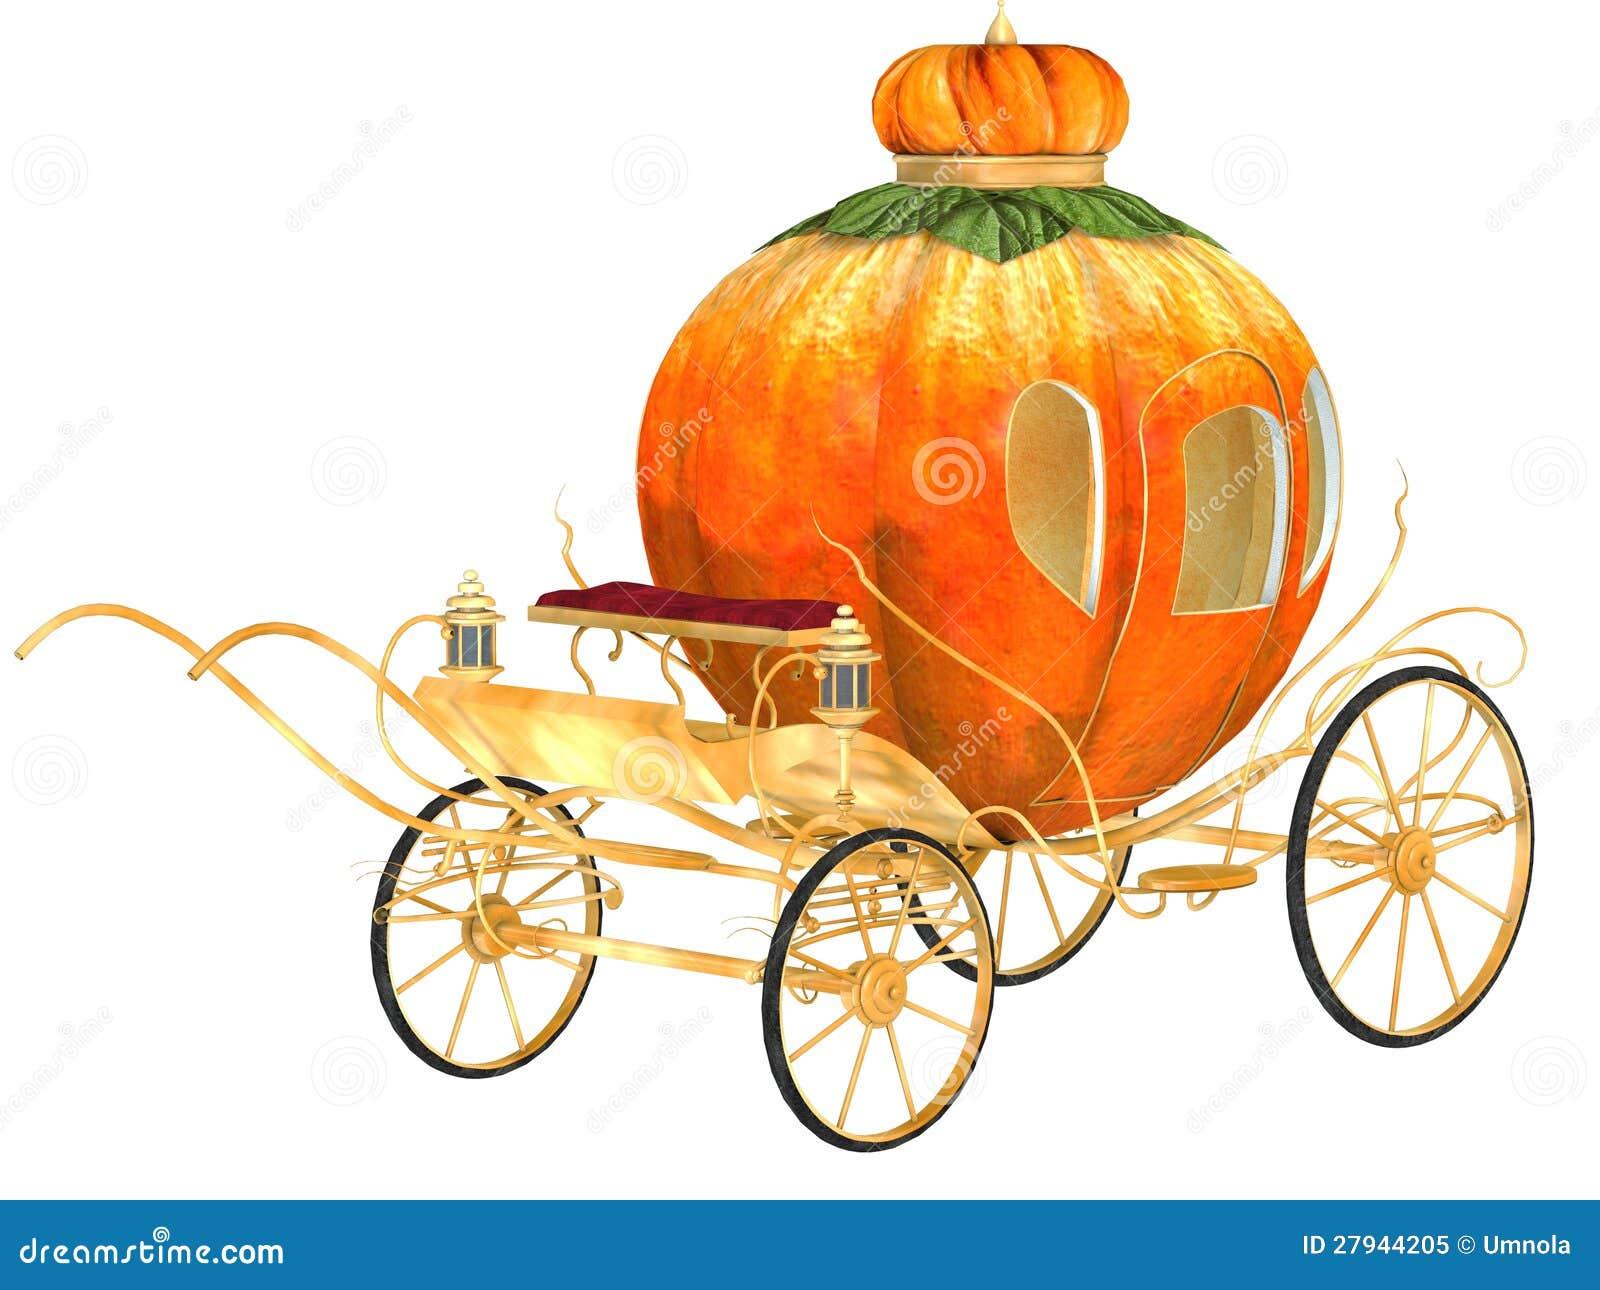 Disney Cinderella Carriage Clipart Cinderella fairy tale pumpkin